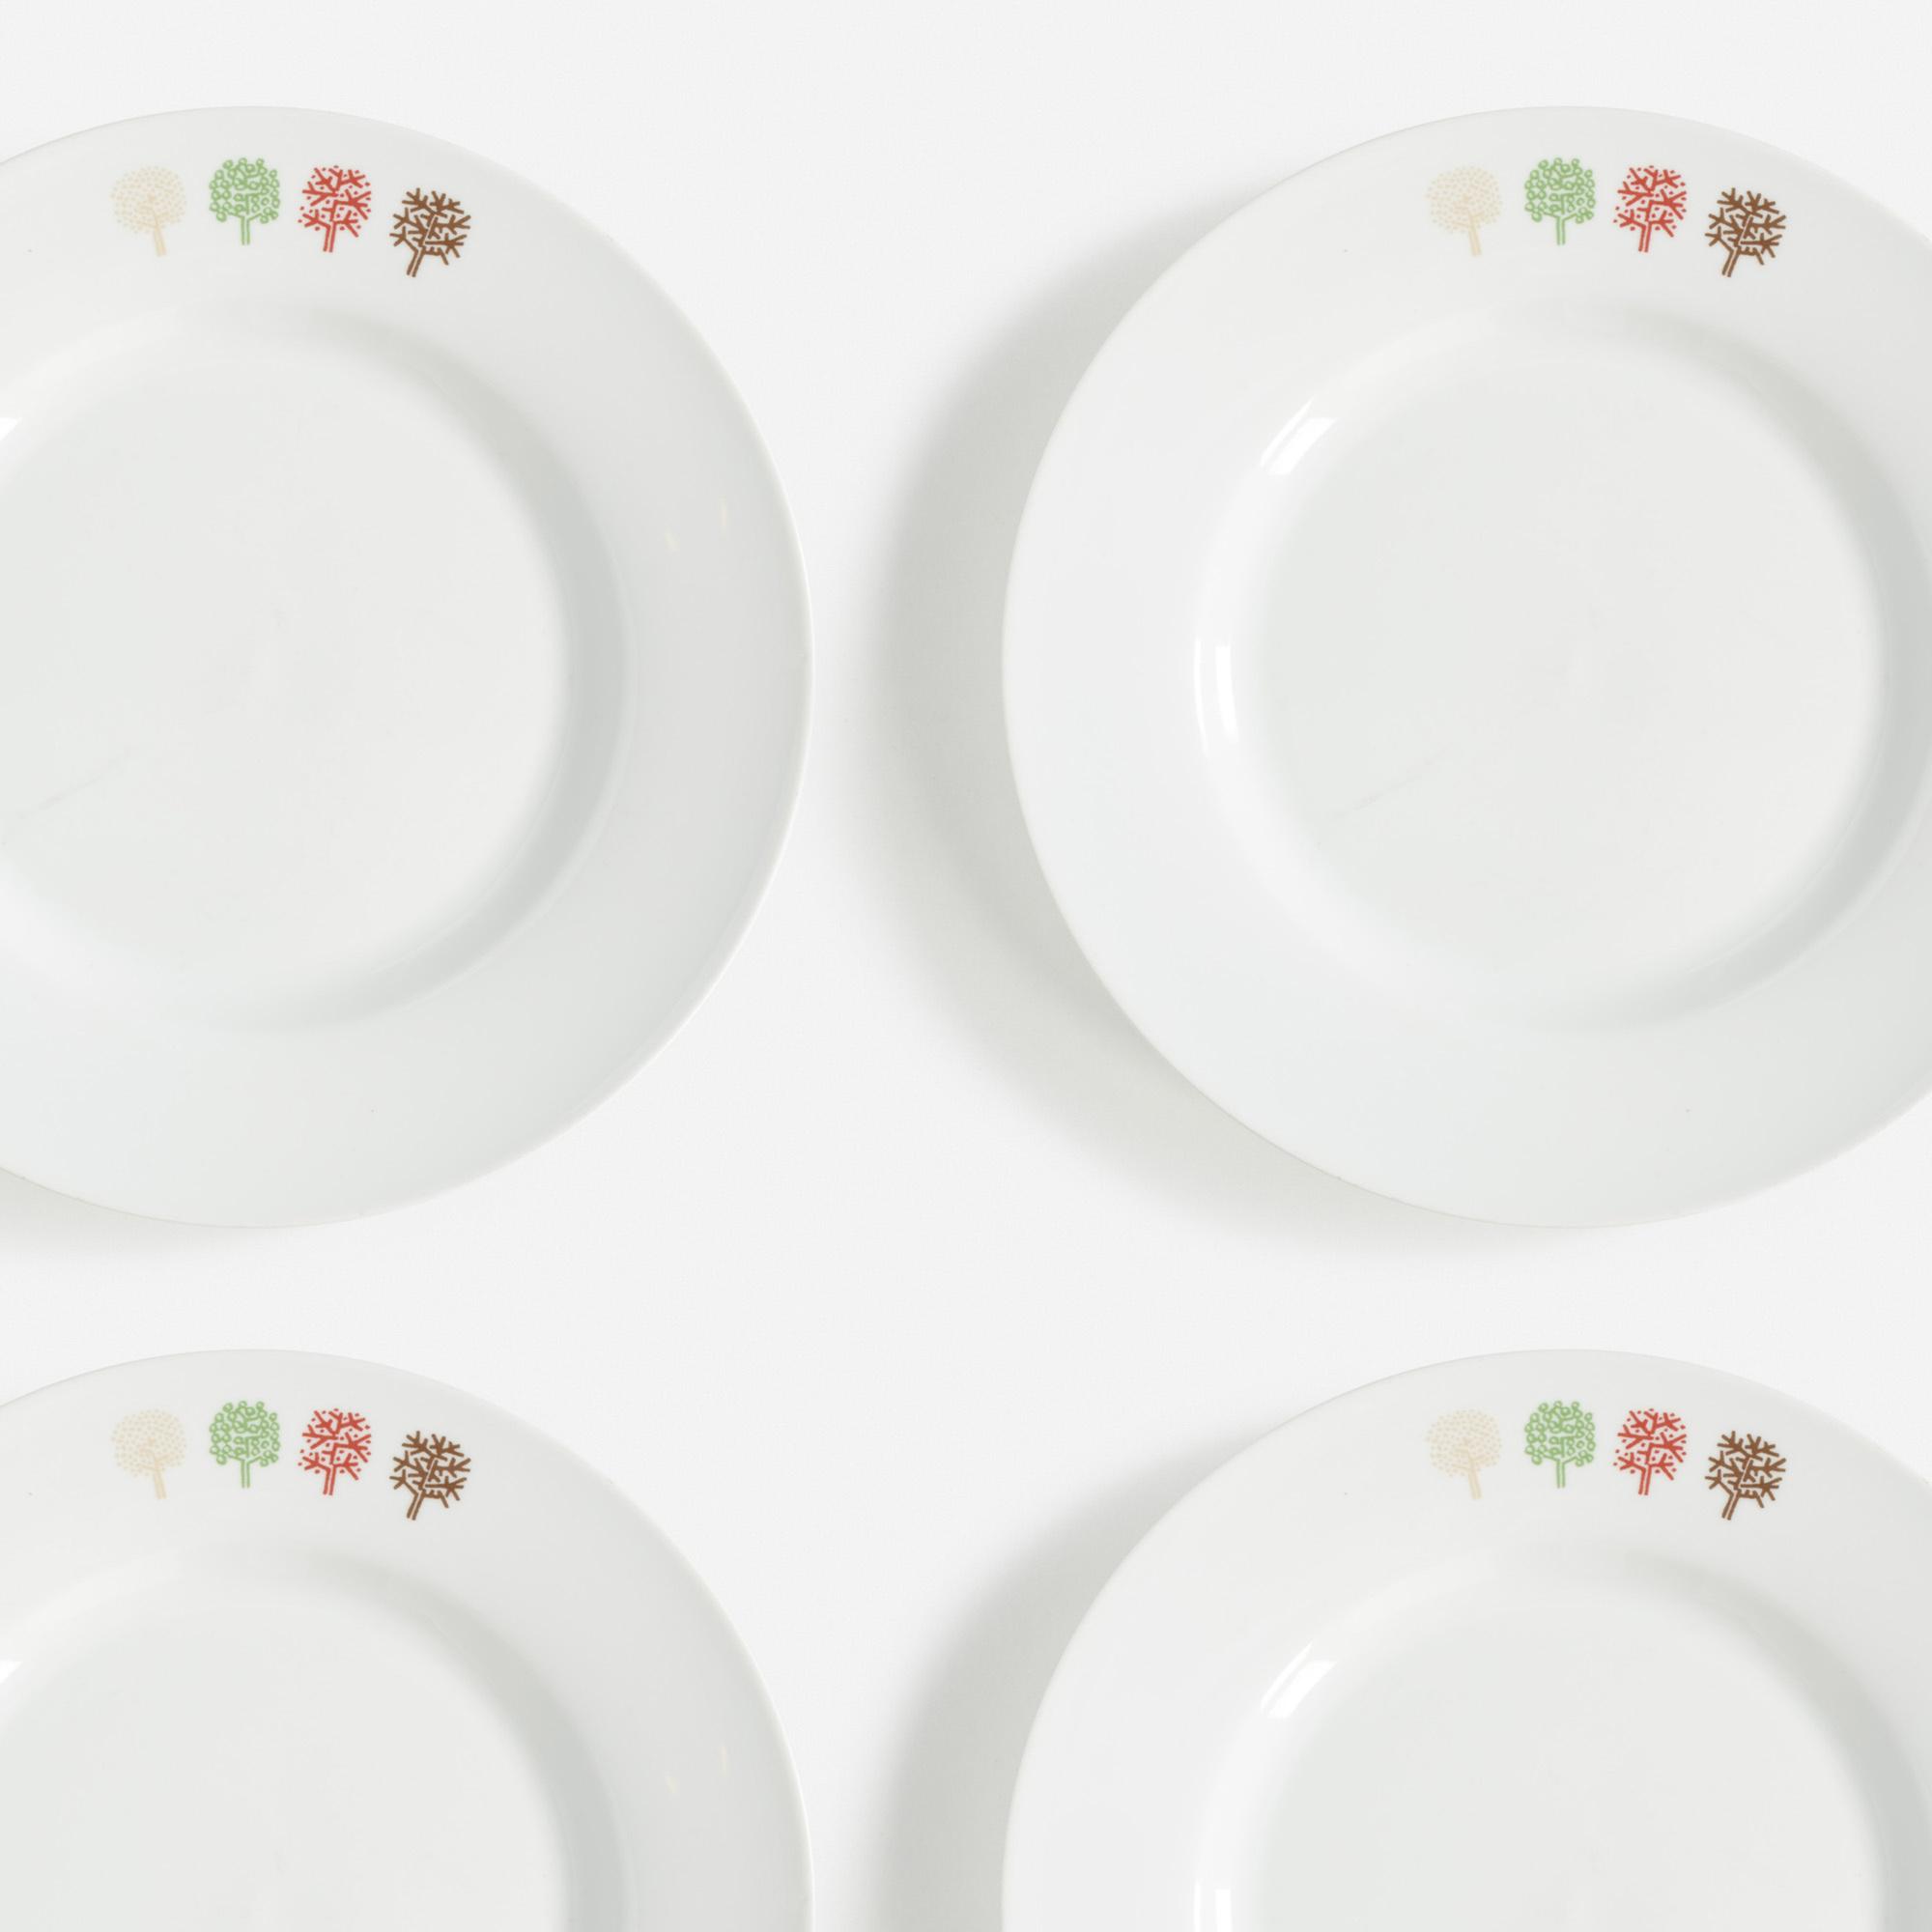 310:  / Four Seasons plates, set of twelve (1 of 1)